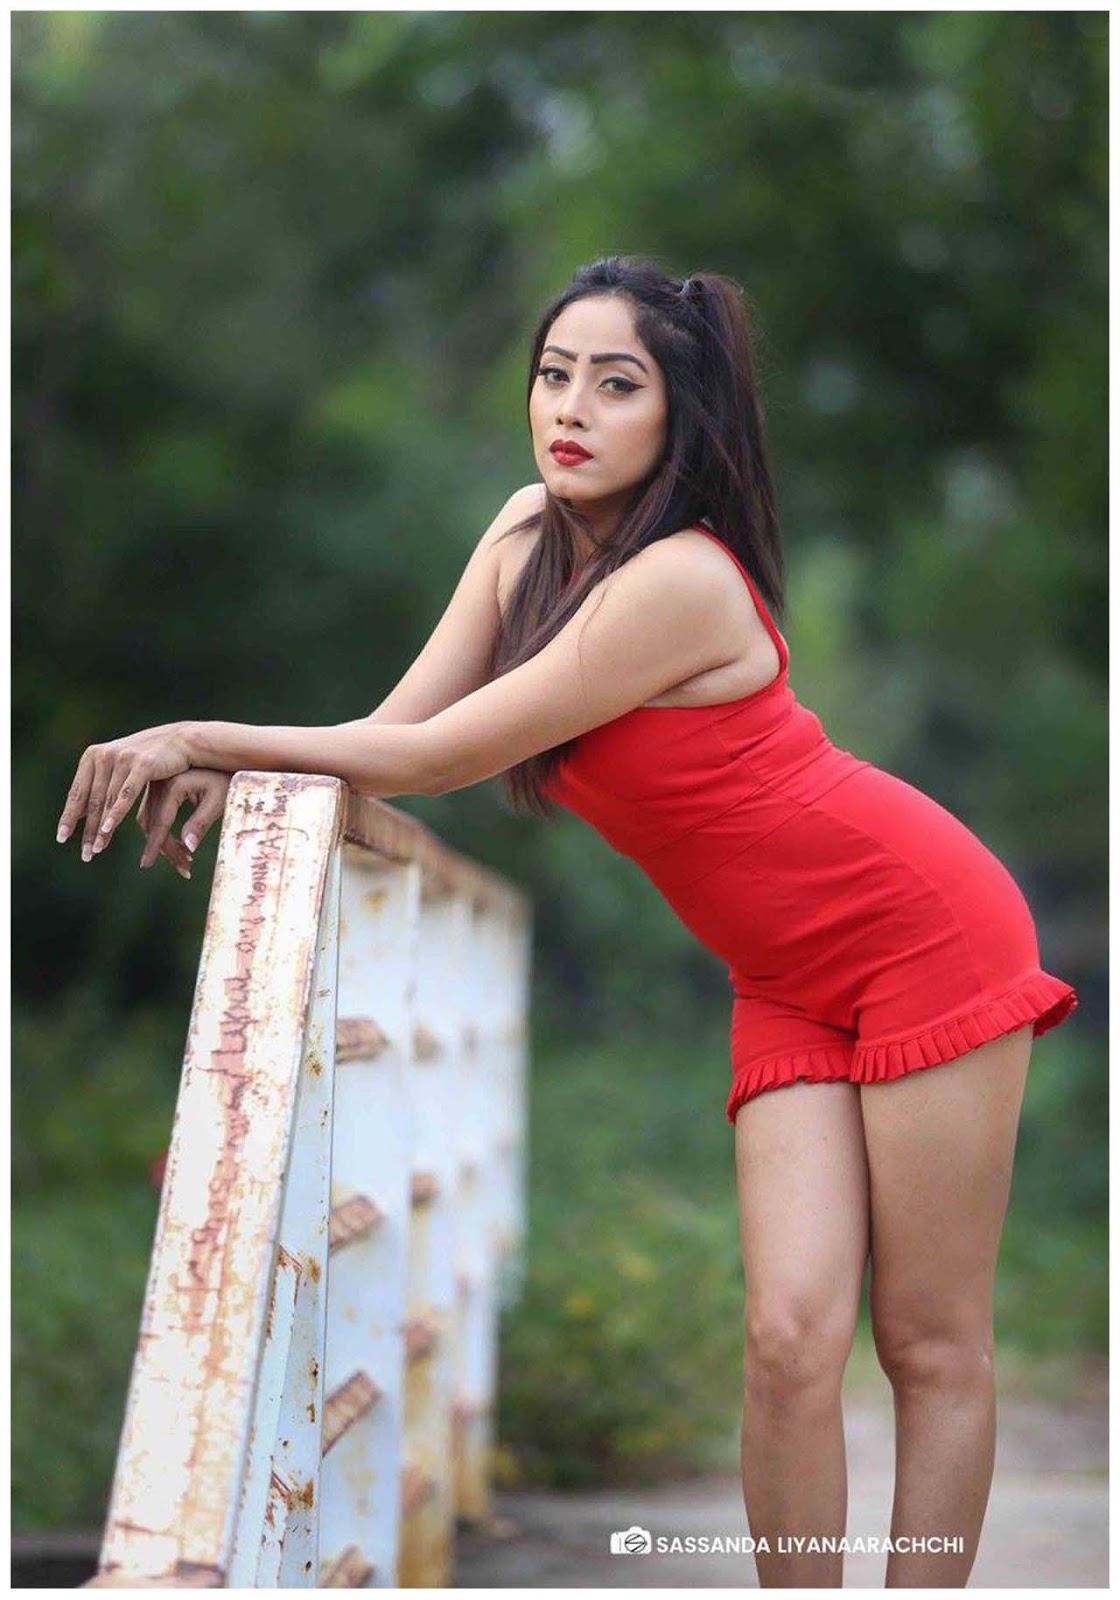 Sri Lankan actress model Piumi Hansamali latest photos in